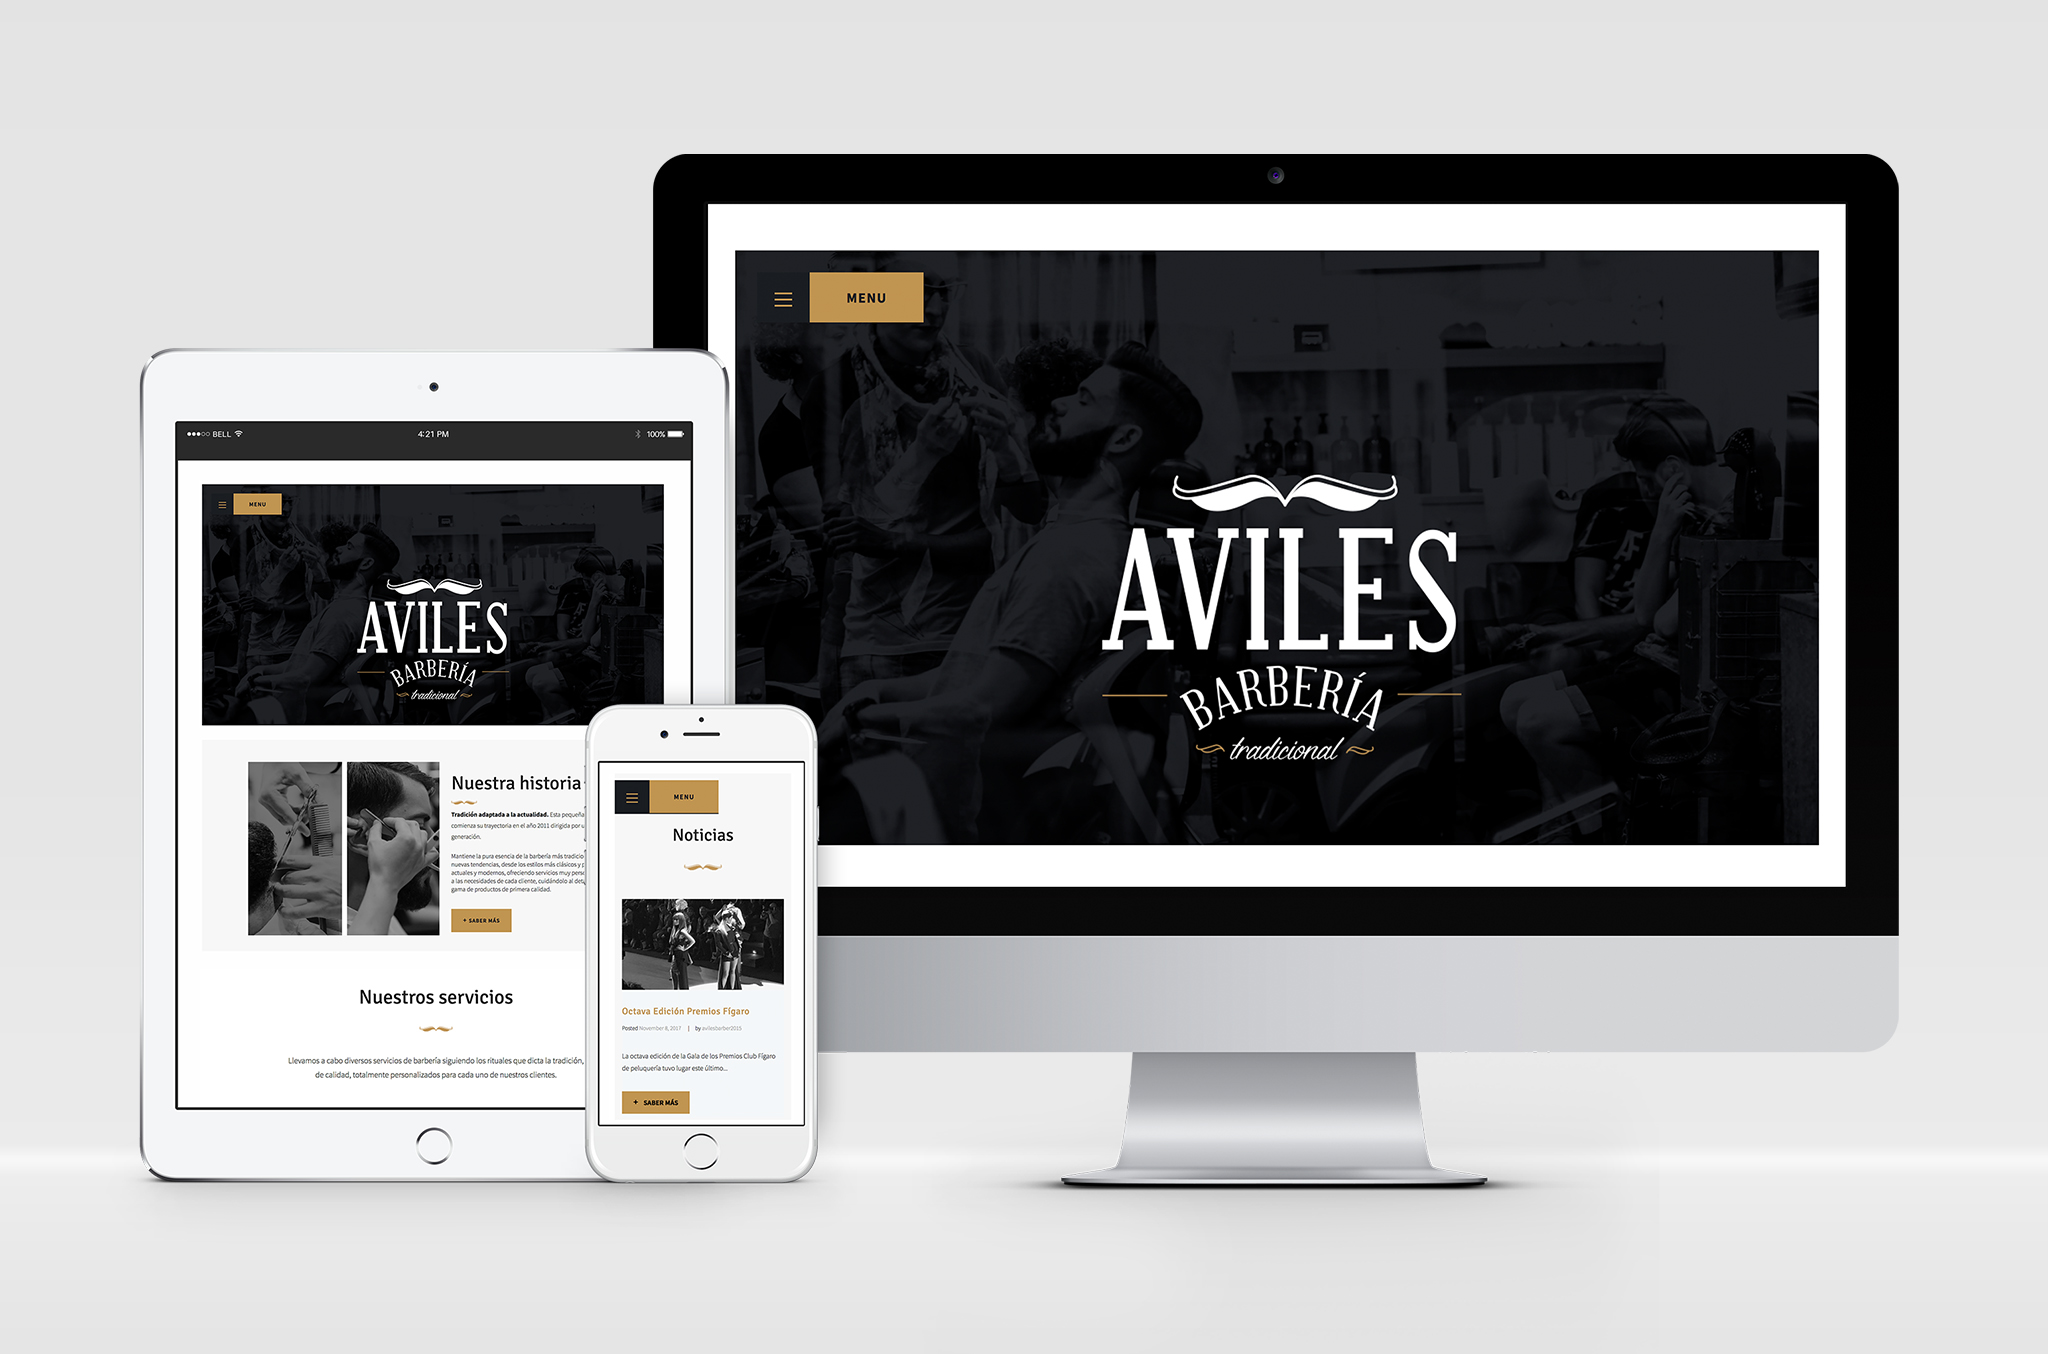 diseño pagiona web barcelona aviles